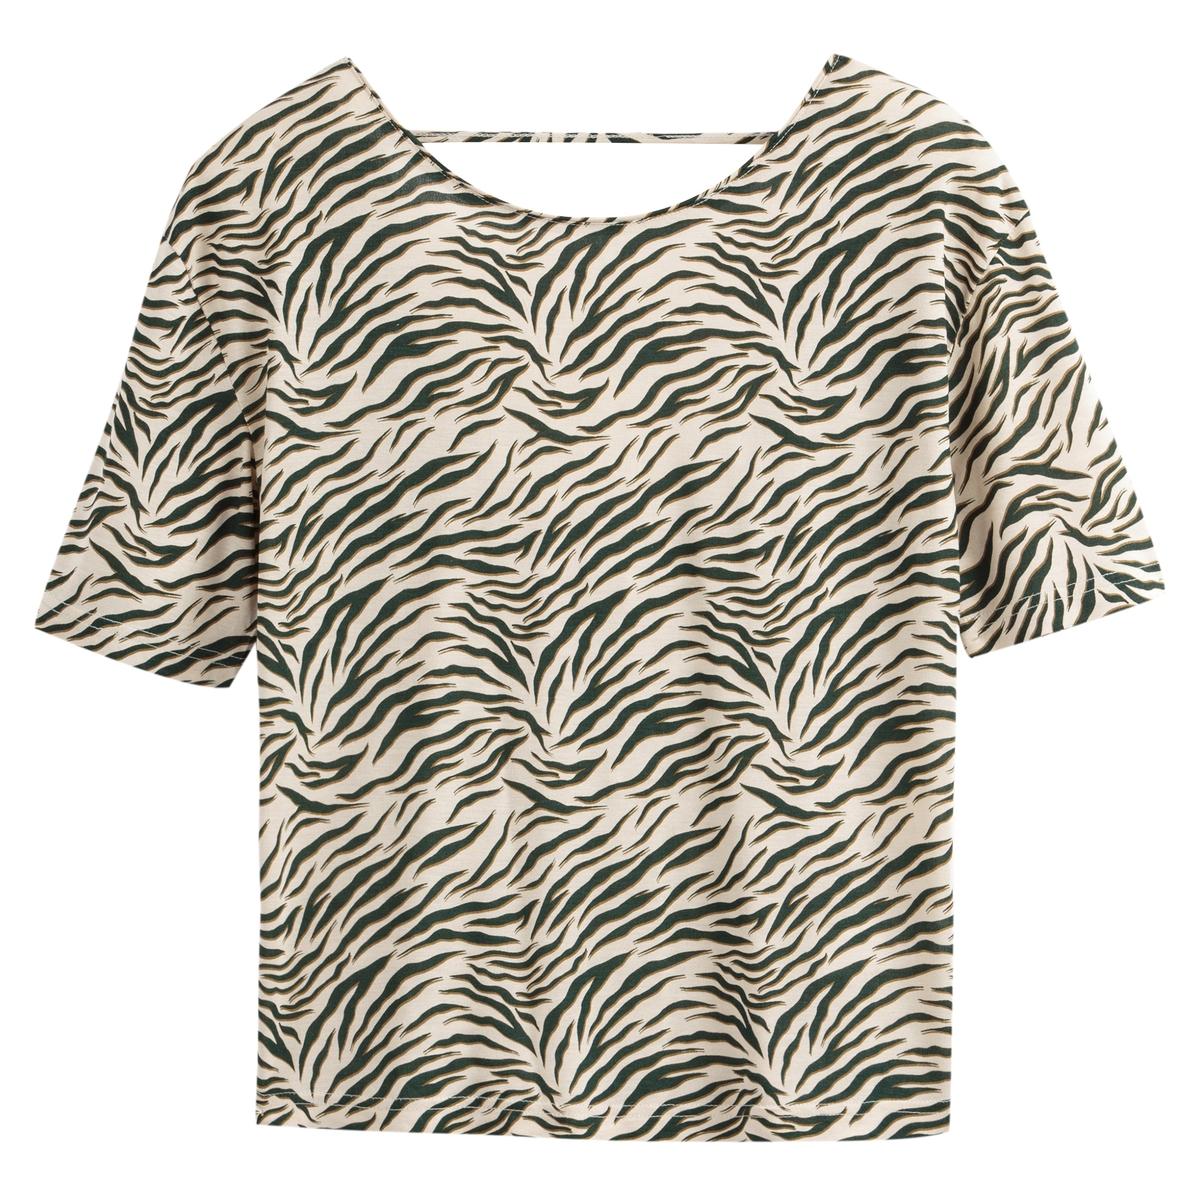 Camisola de gola redonda, estampado zebra